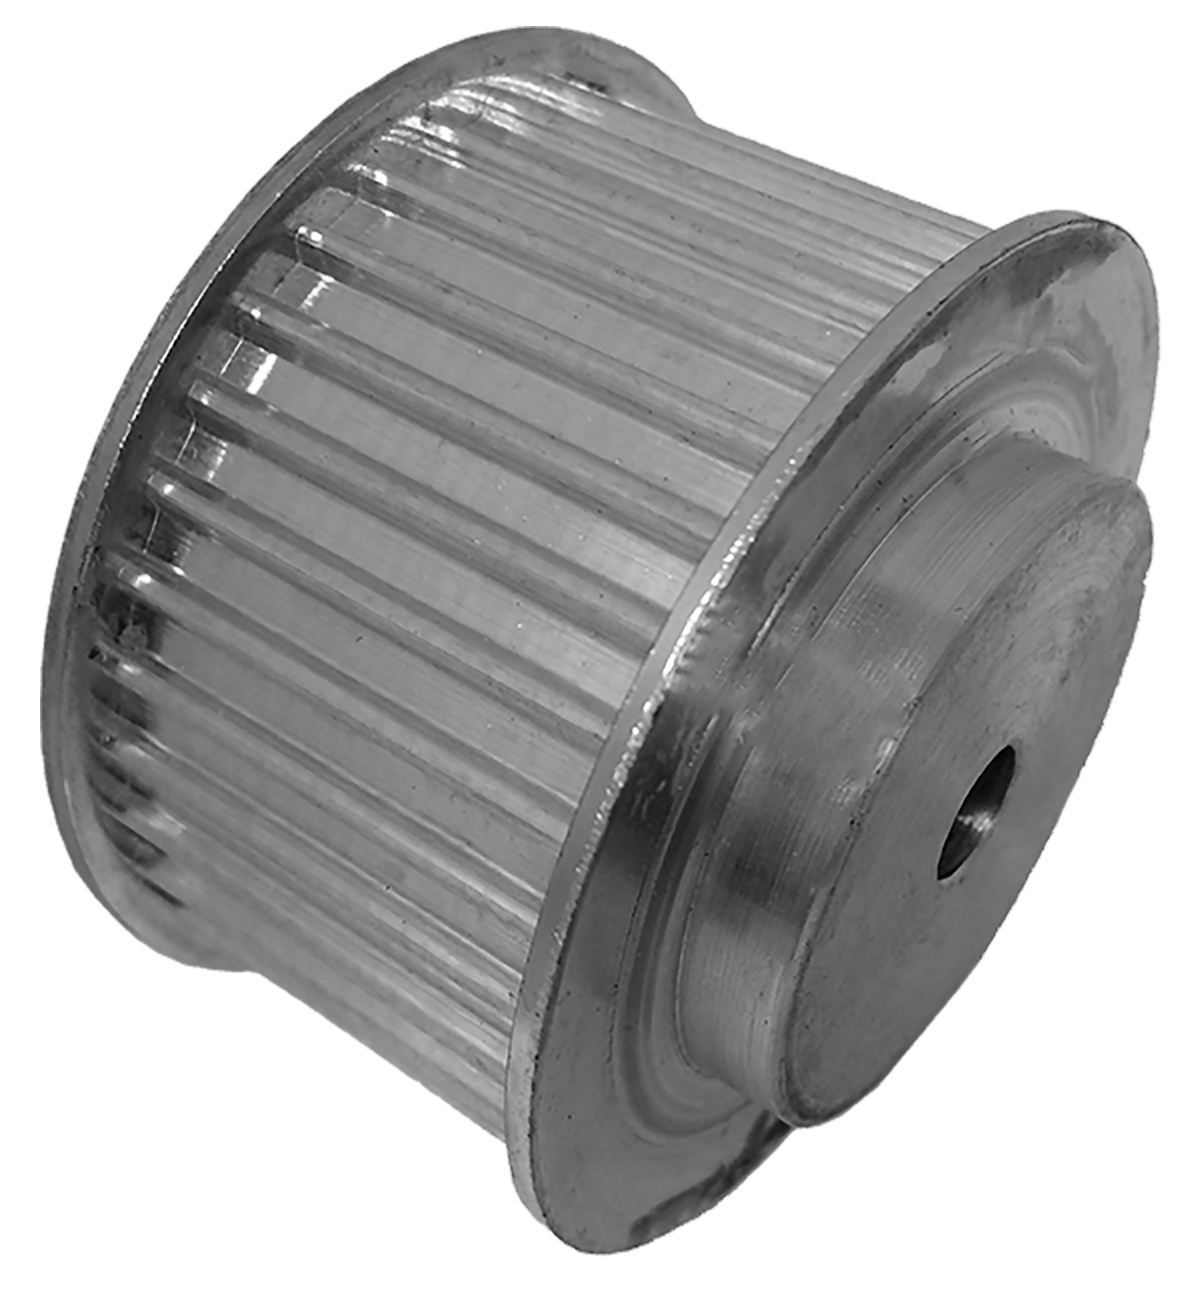 38AT5/36-2 - Aluminum Metric Pulleys